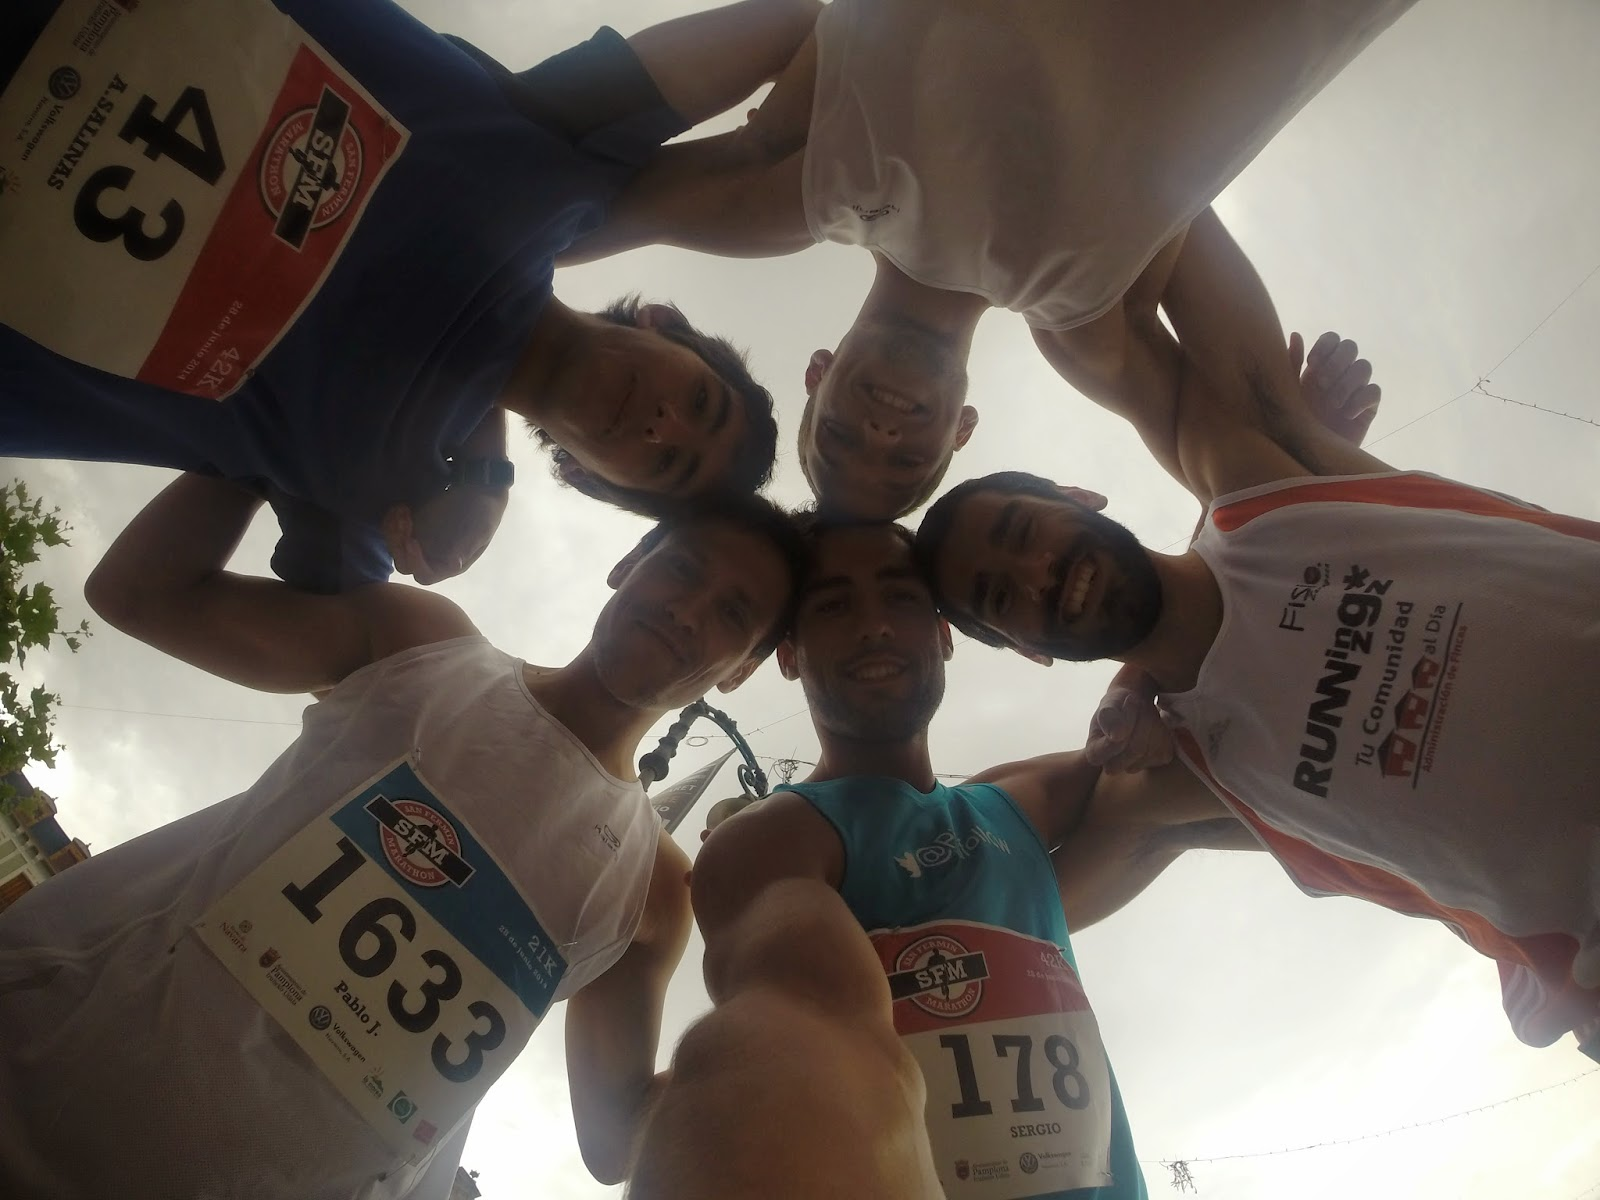 equipo runners san fermin maraton pamplona 2014